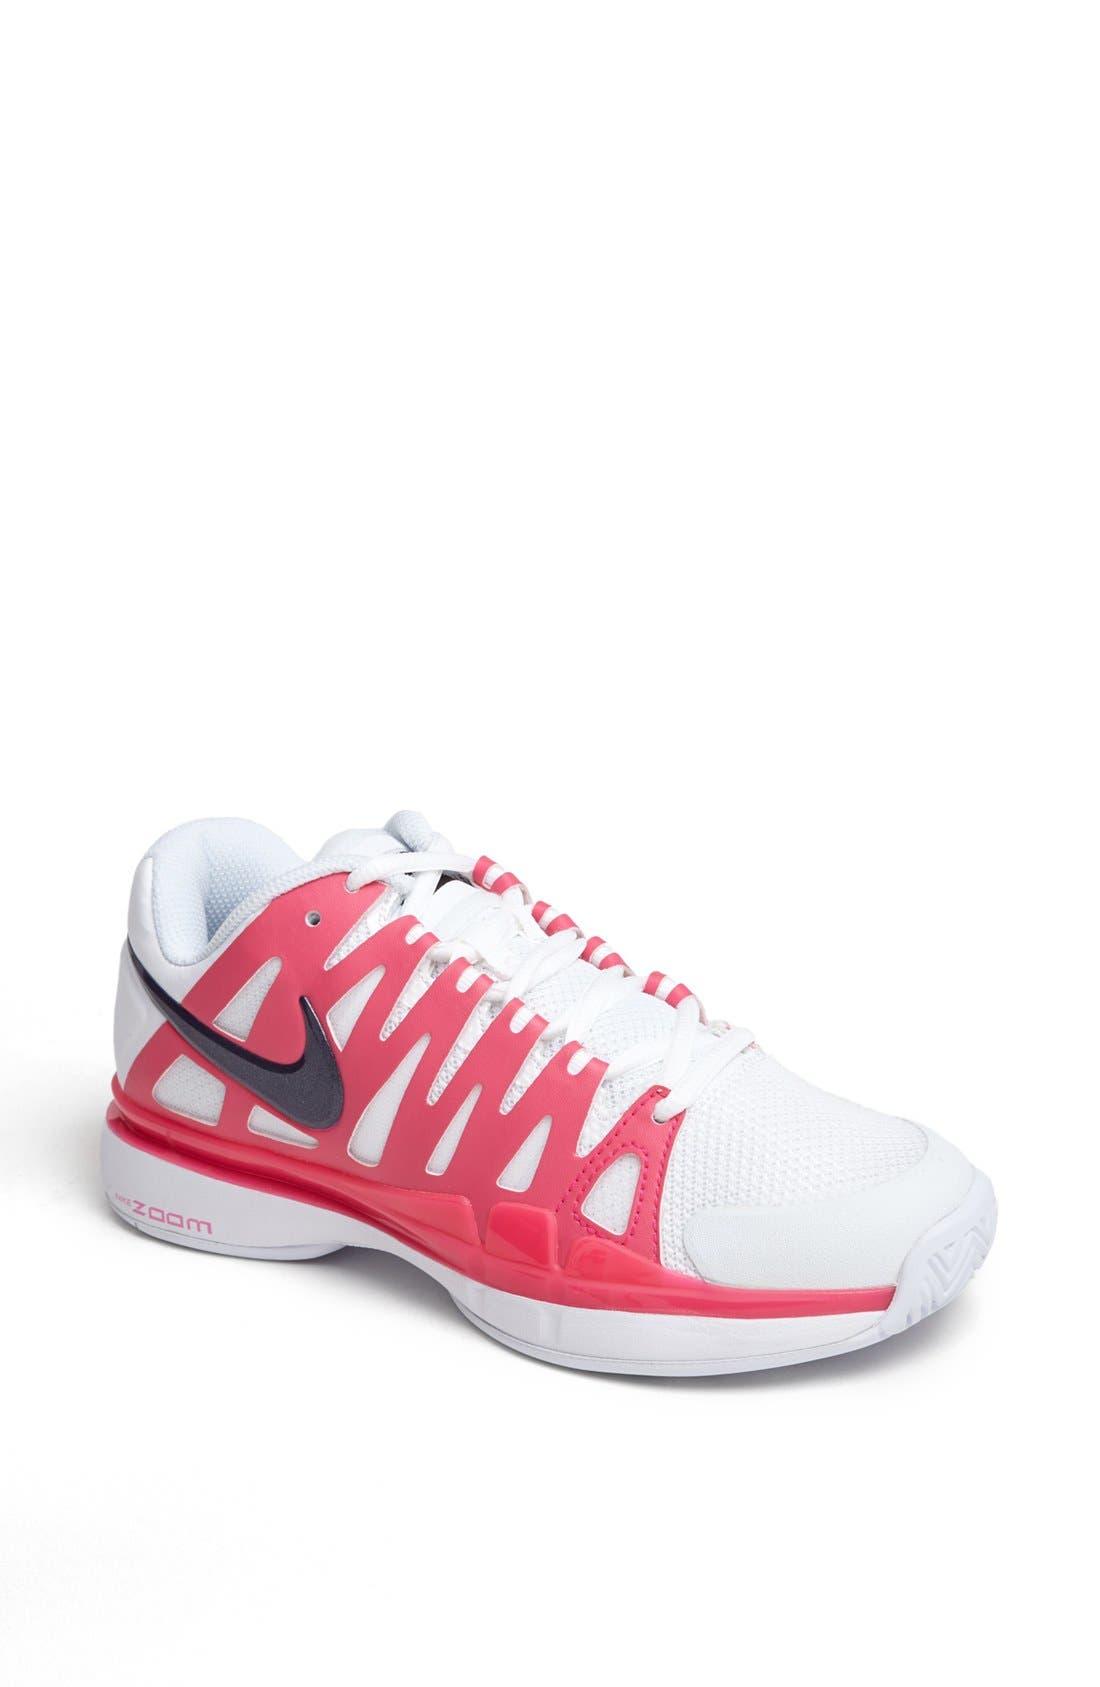 Alternate Image 1 Selected - Nike 'Zoom Vapor 9 Tour' Tennis Shoe (Women)